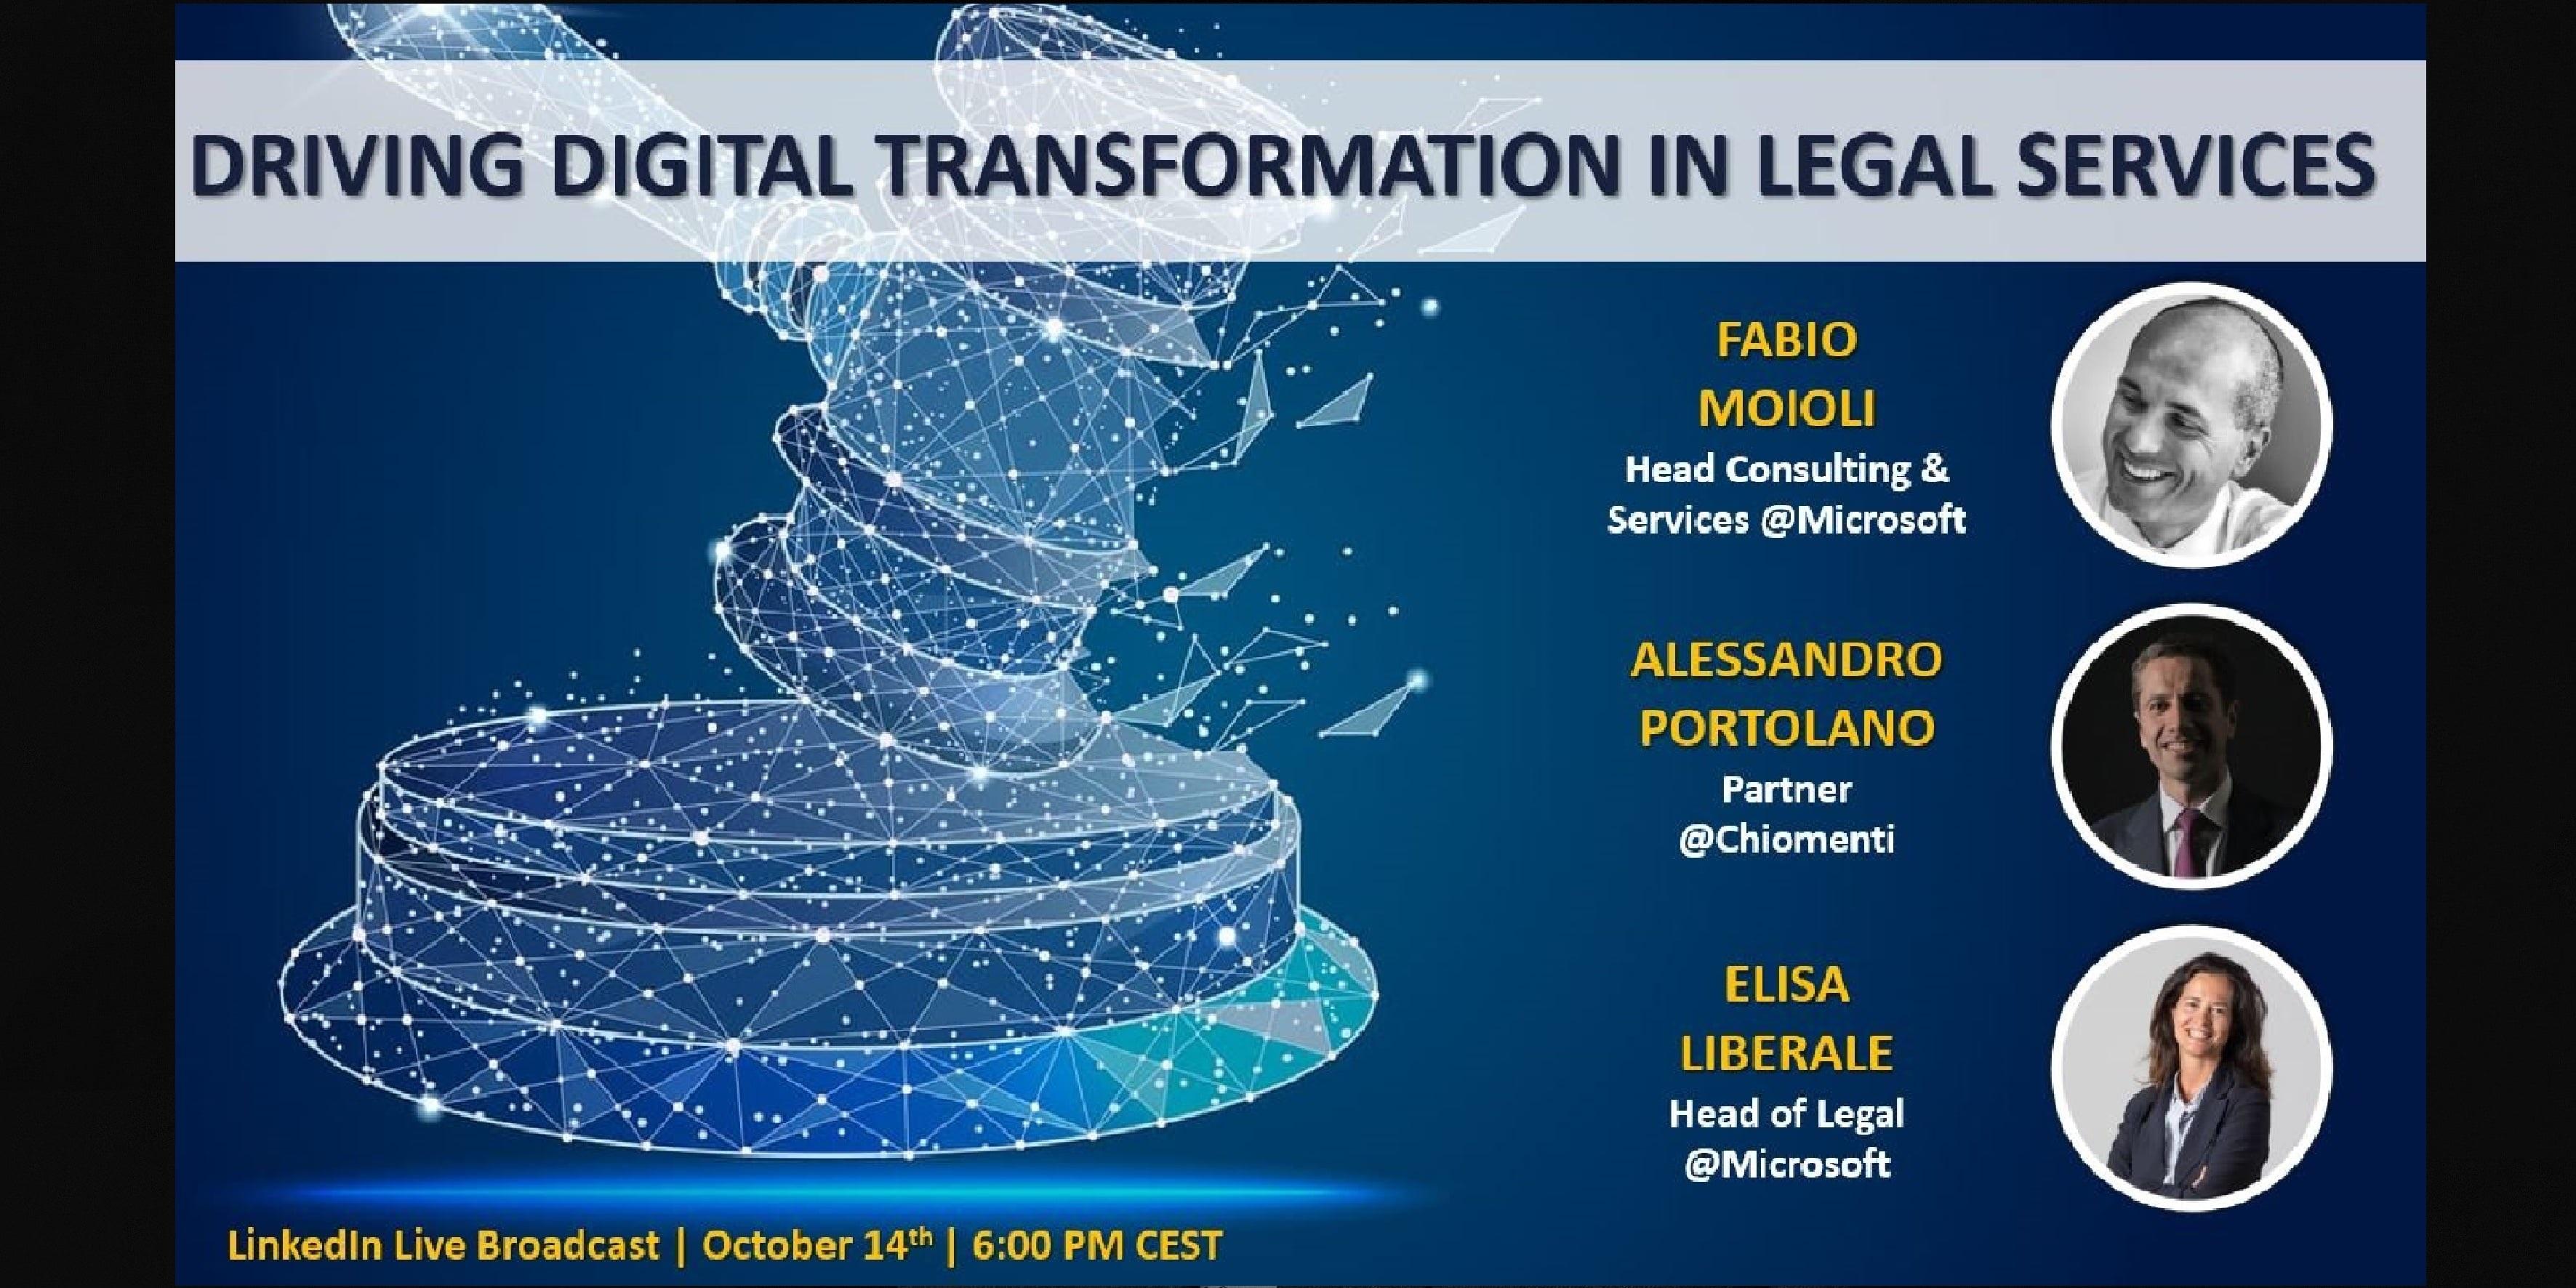 """Driving Digital Transformation in Legal Services"" LinkedIn Live Broadcast - October 14, 2020"